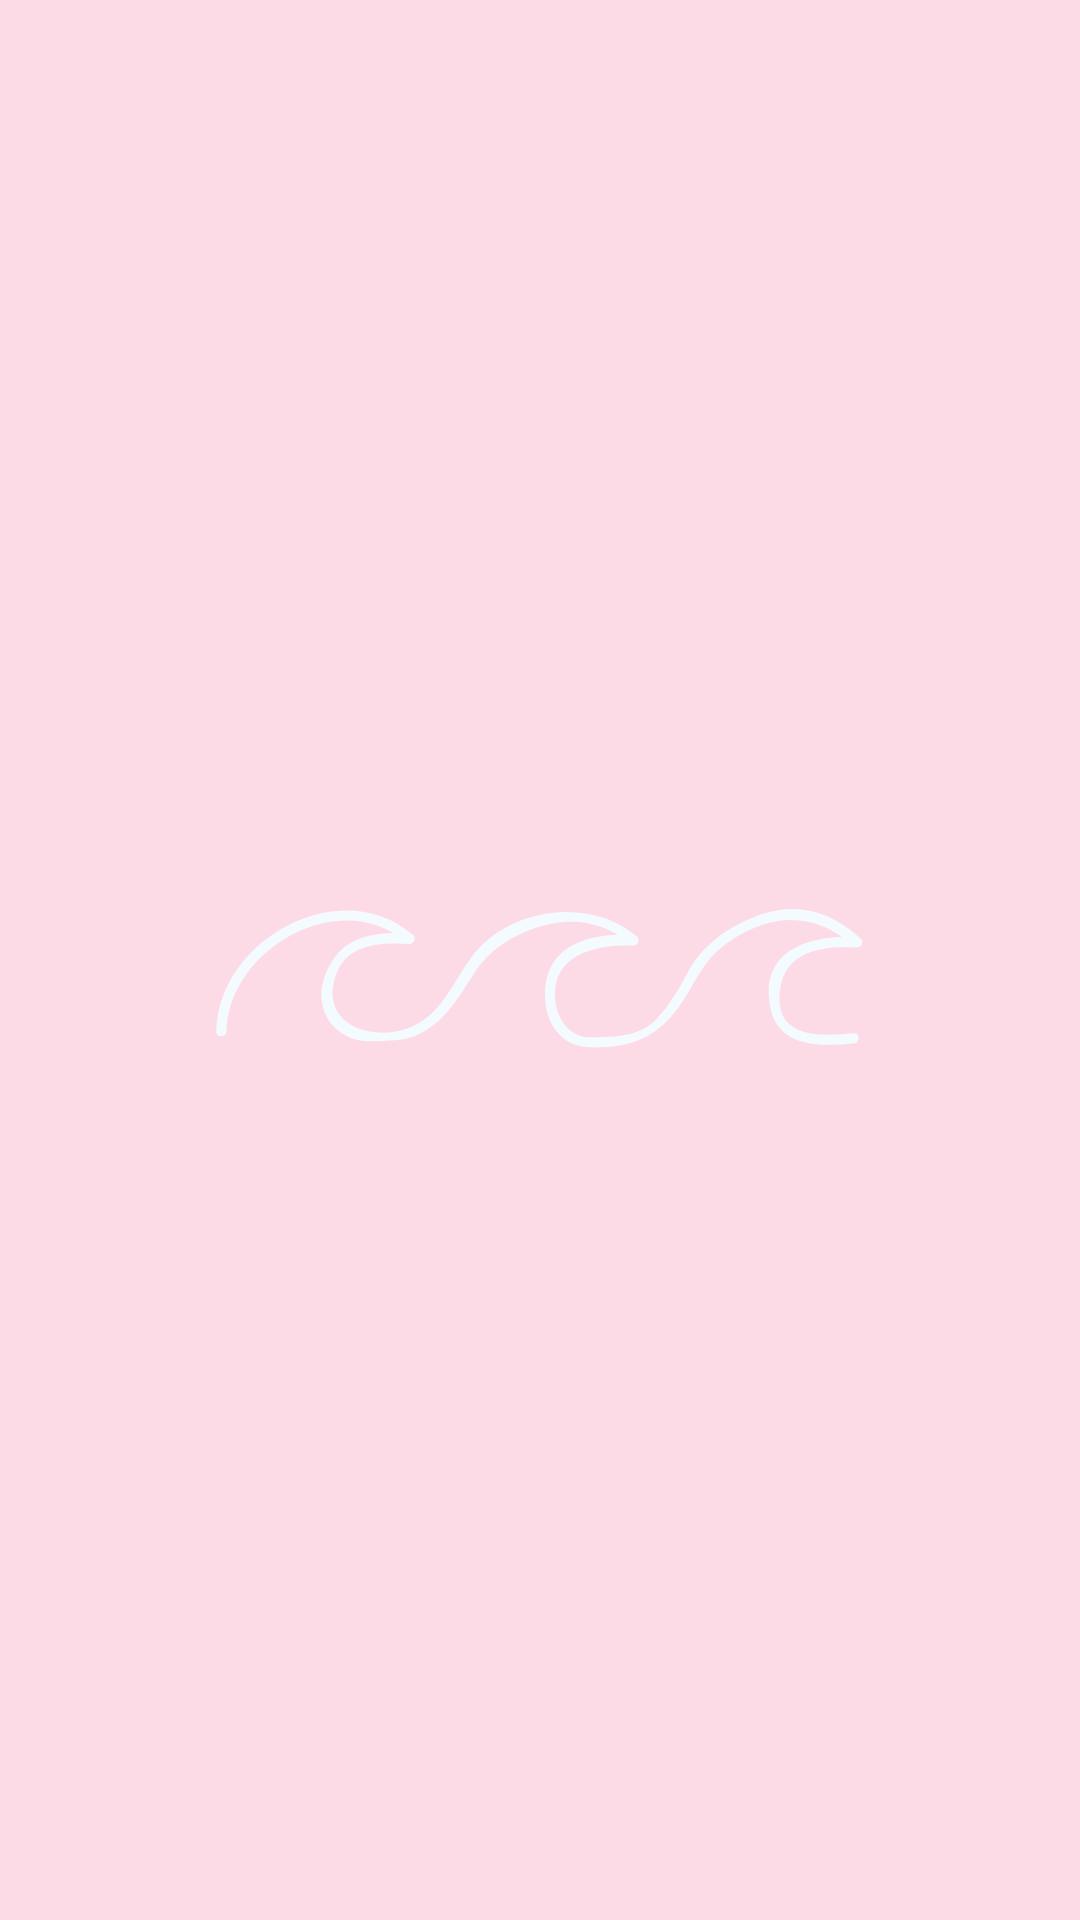 Light Pink Aesthetic Wave Phone Wallpaper